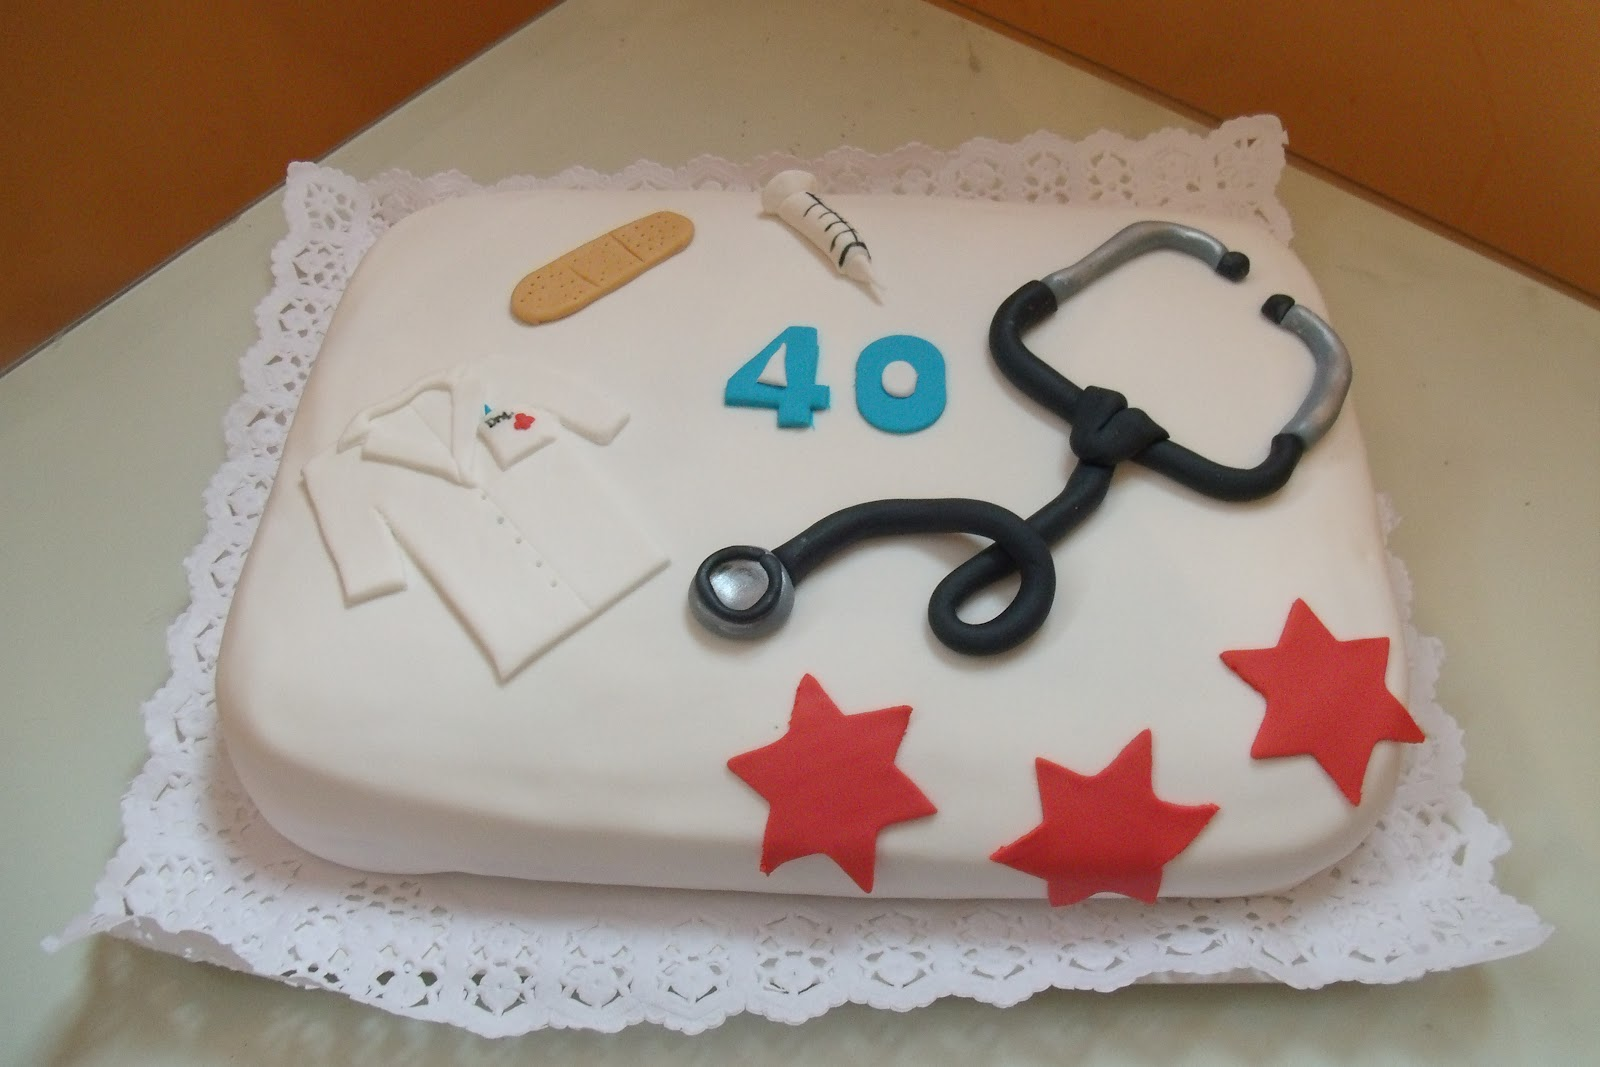 Images Tortas Figuras Dulce Art Baby Shower Bautizo Cake on Pinterest